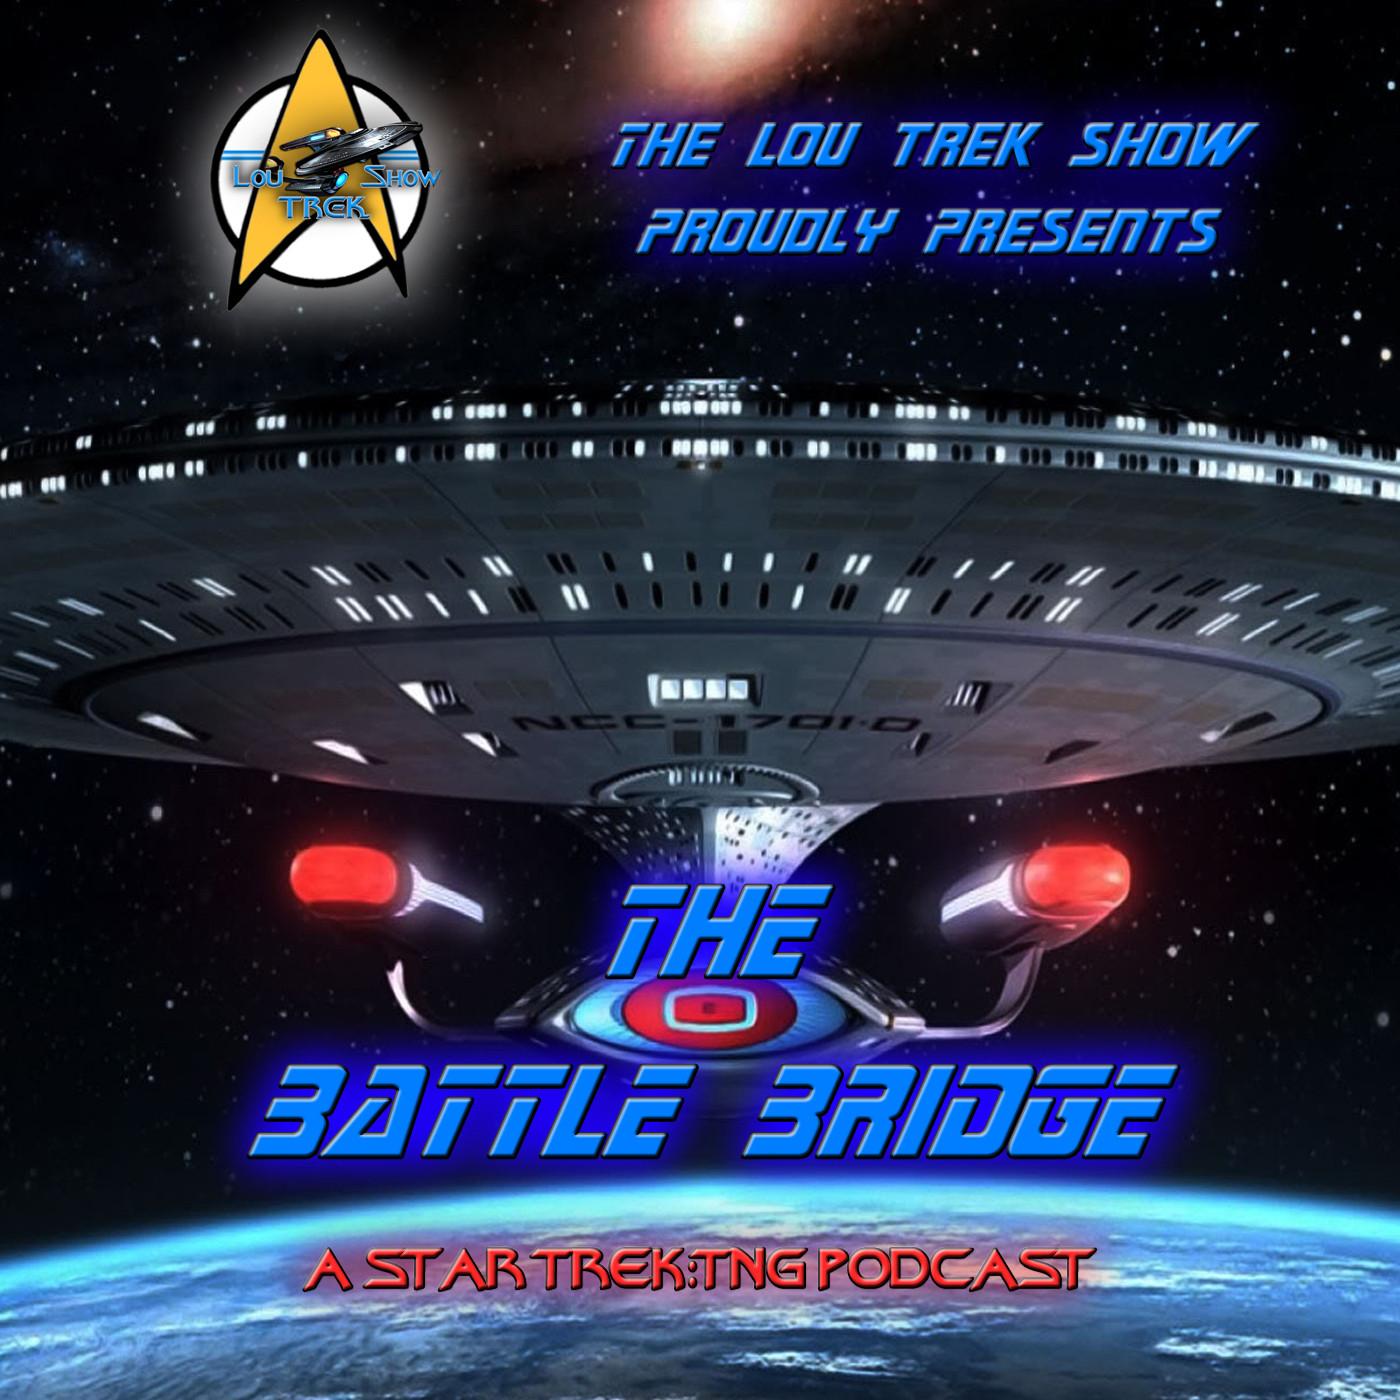 The Battle Bridge